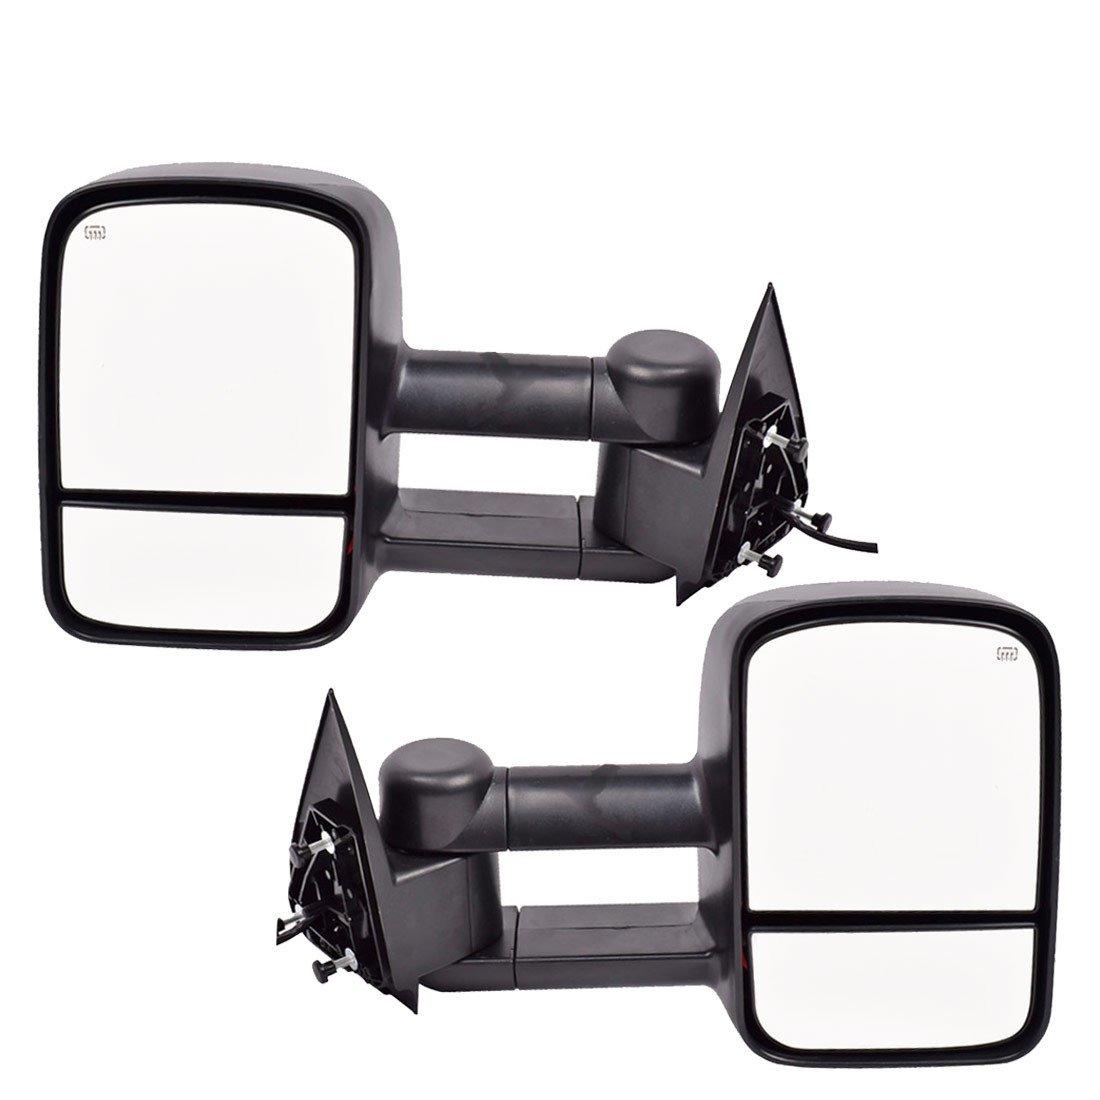 DEDC Towing Mirrors Chevy Silverado 1500 2500 3500 Side View Mirrors For 2003-2006 Chevy Silverado GMC Sierra Power Heated Foldable Pair